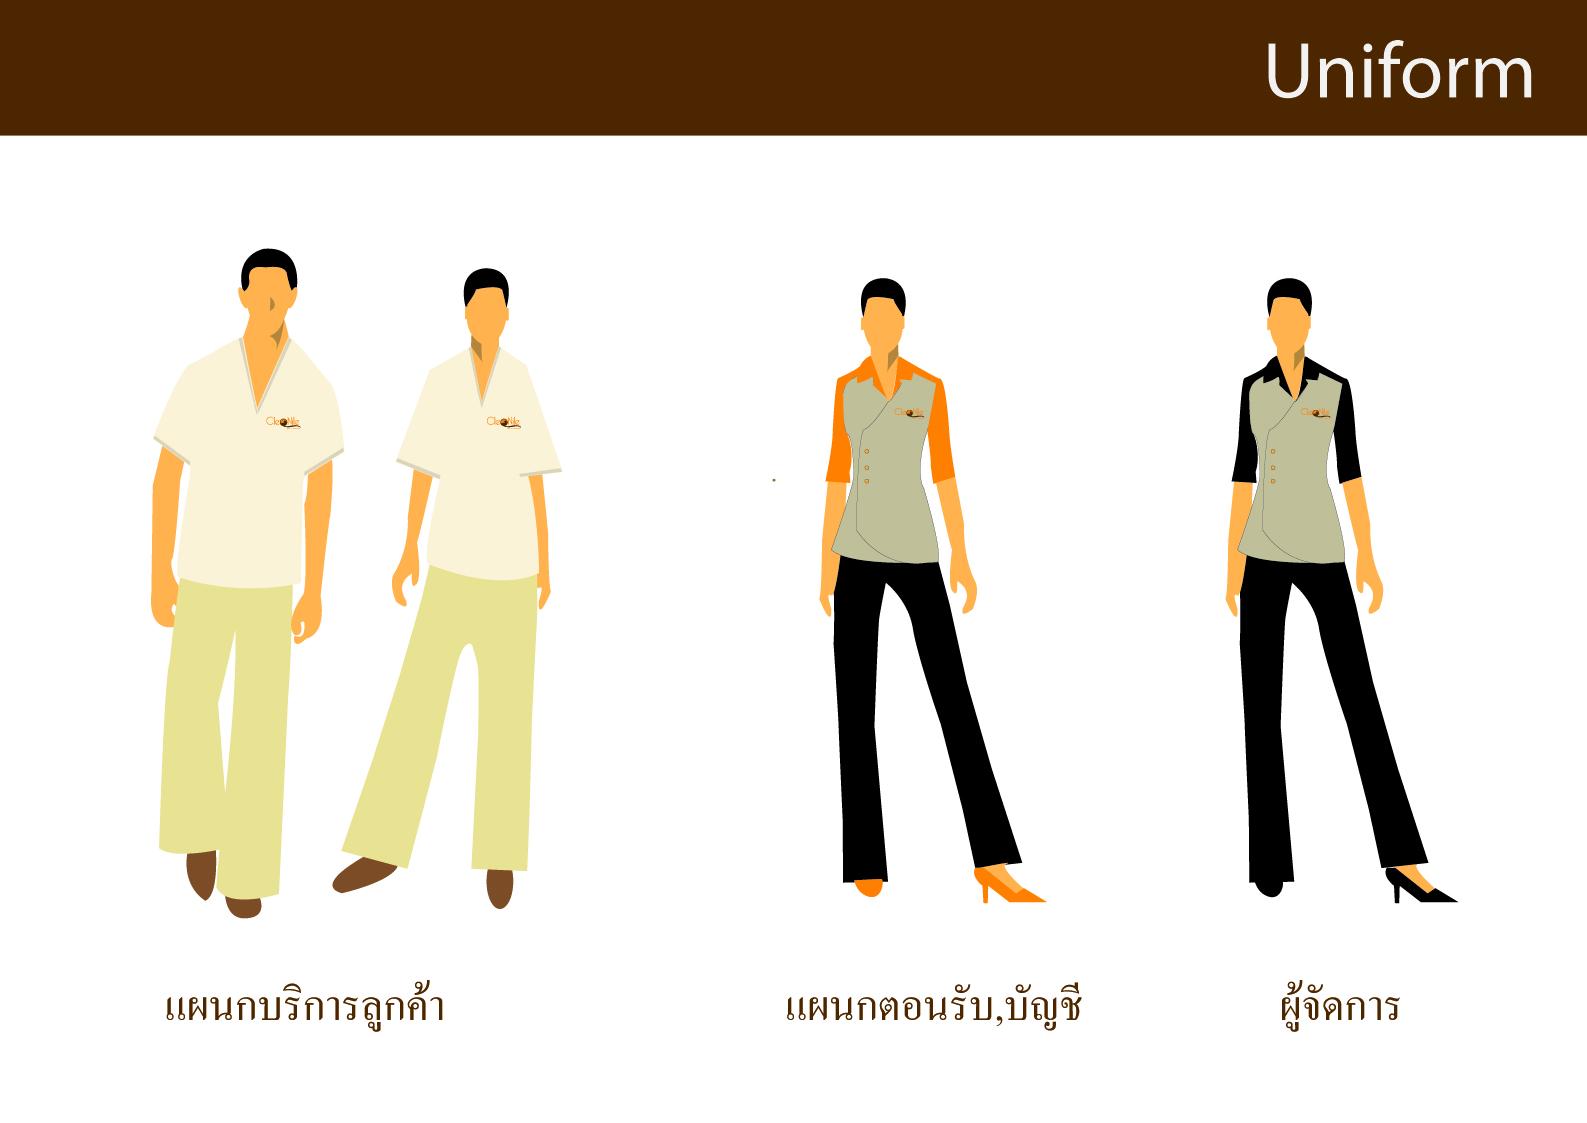 Beauty salon wear and uniforms simon jersey for Spa uniform singapore